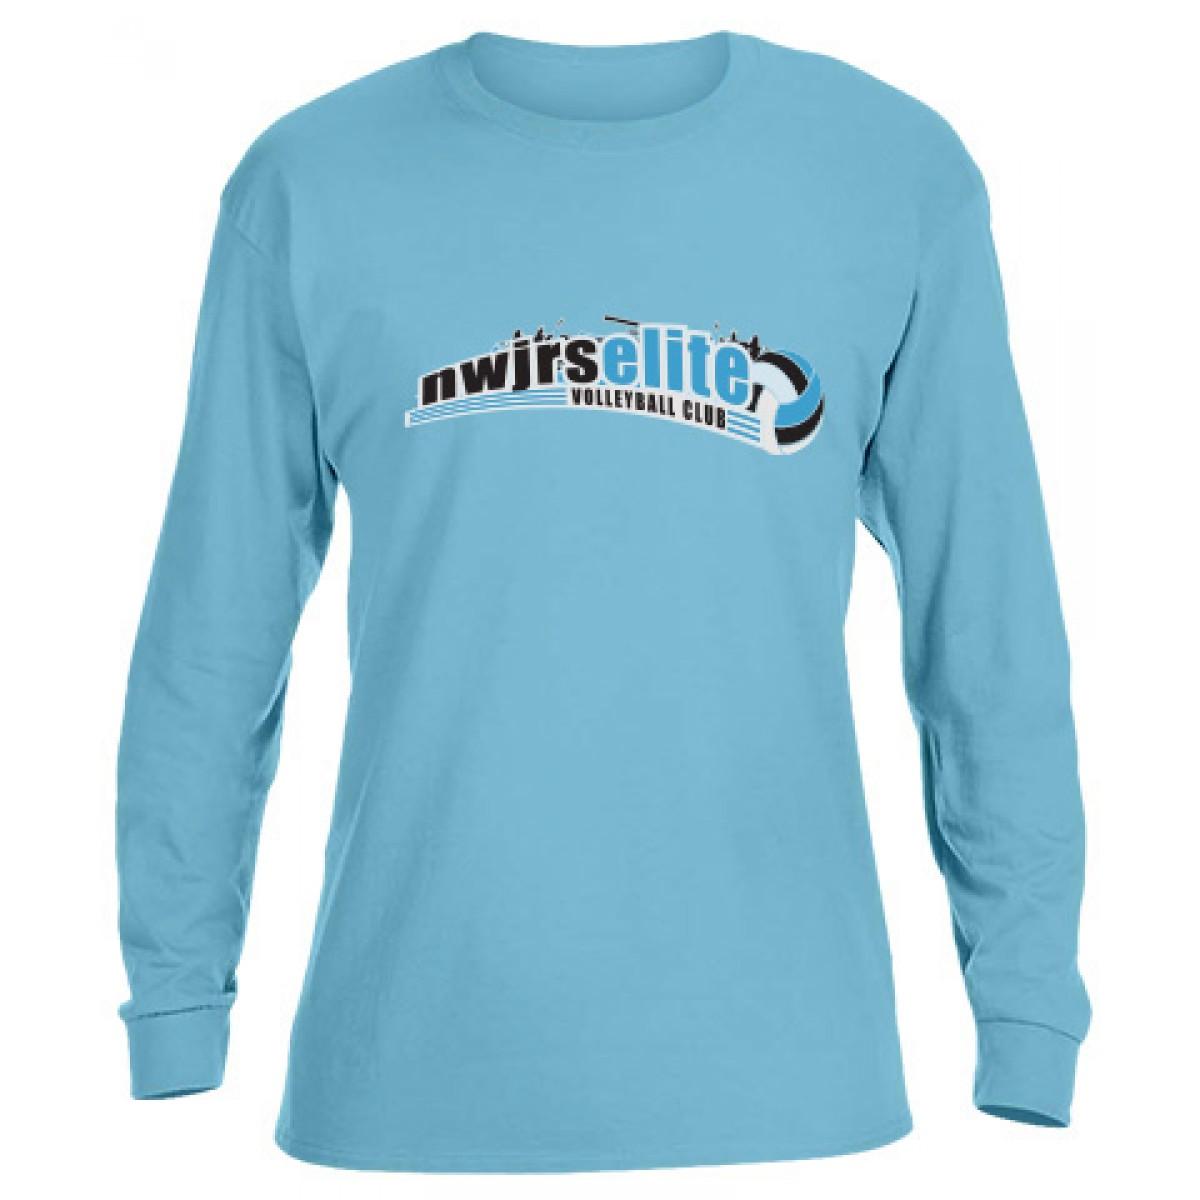 Northwest Volleyball Foundation Scholarship Program-Sky Blue-XL